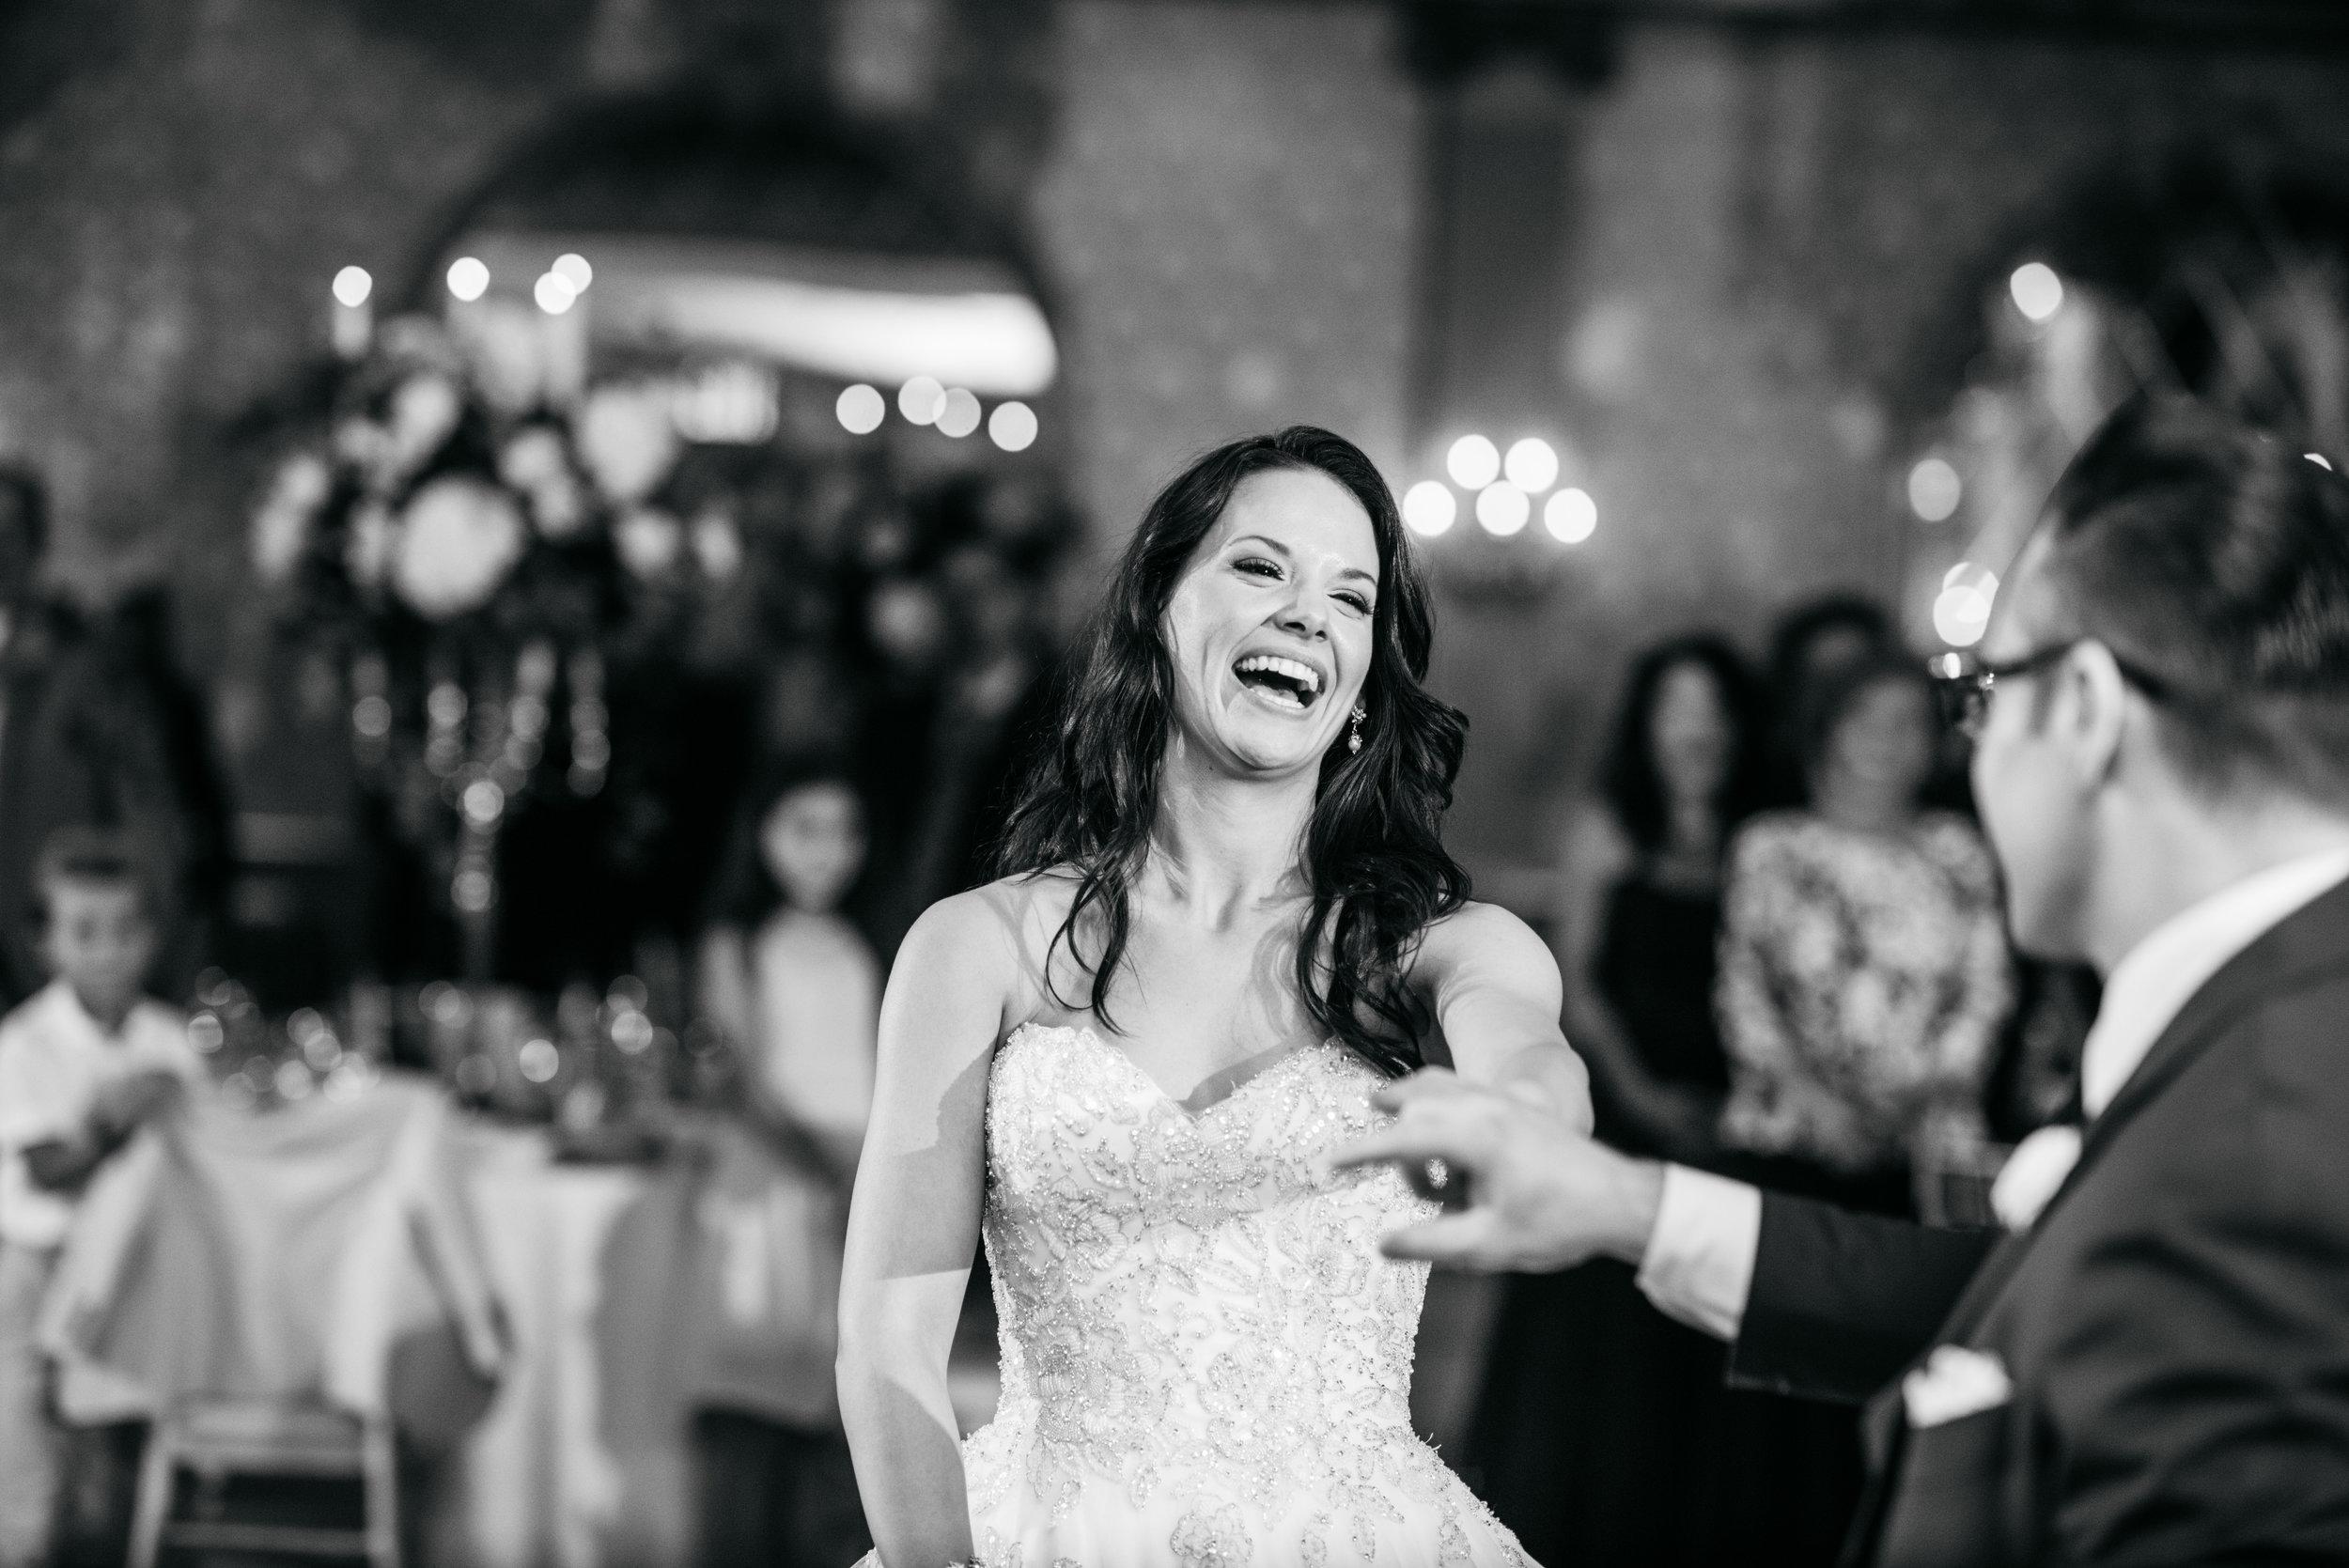 WeddingPhotos | NJPhotographer | Highlights-12-9.jpg